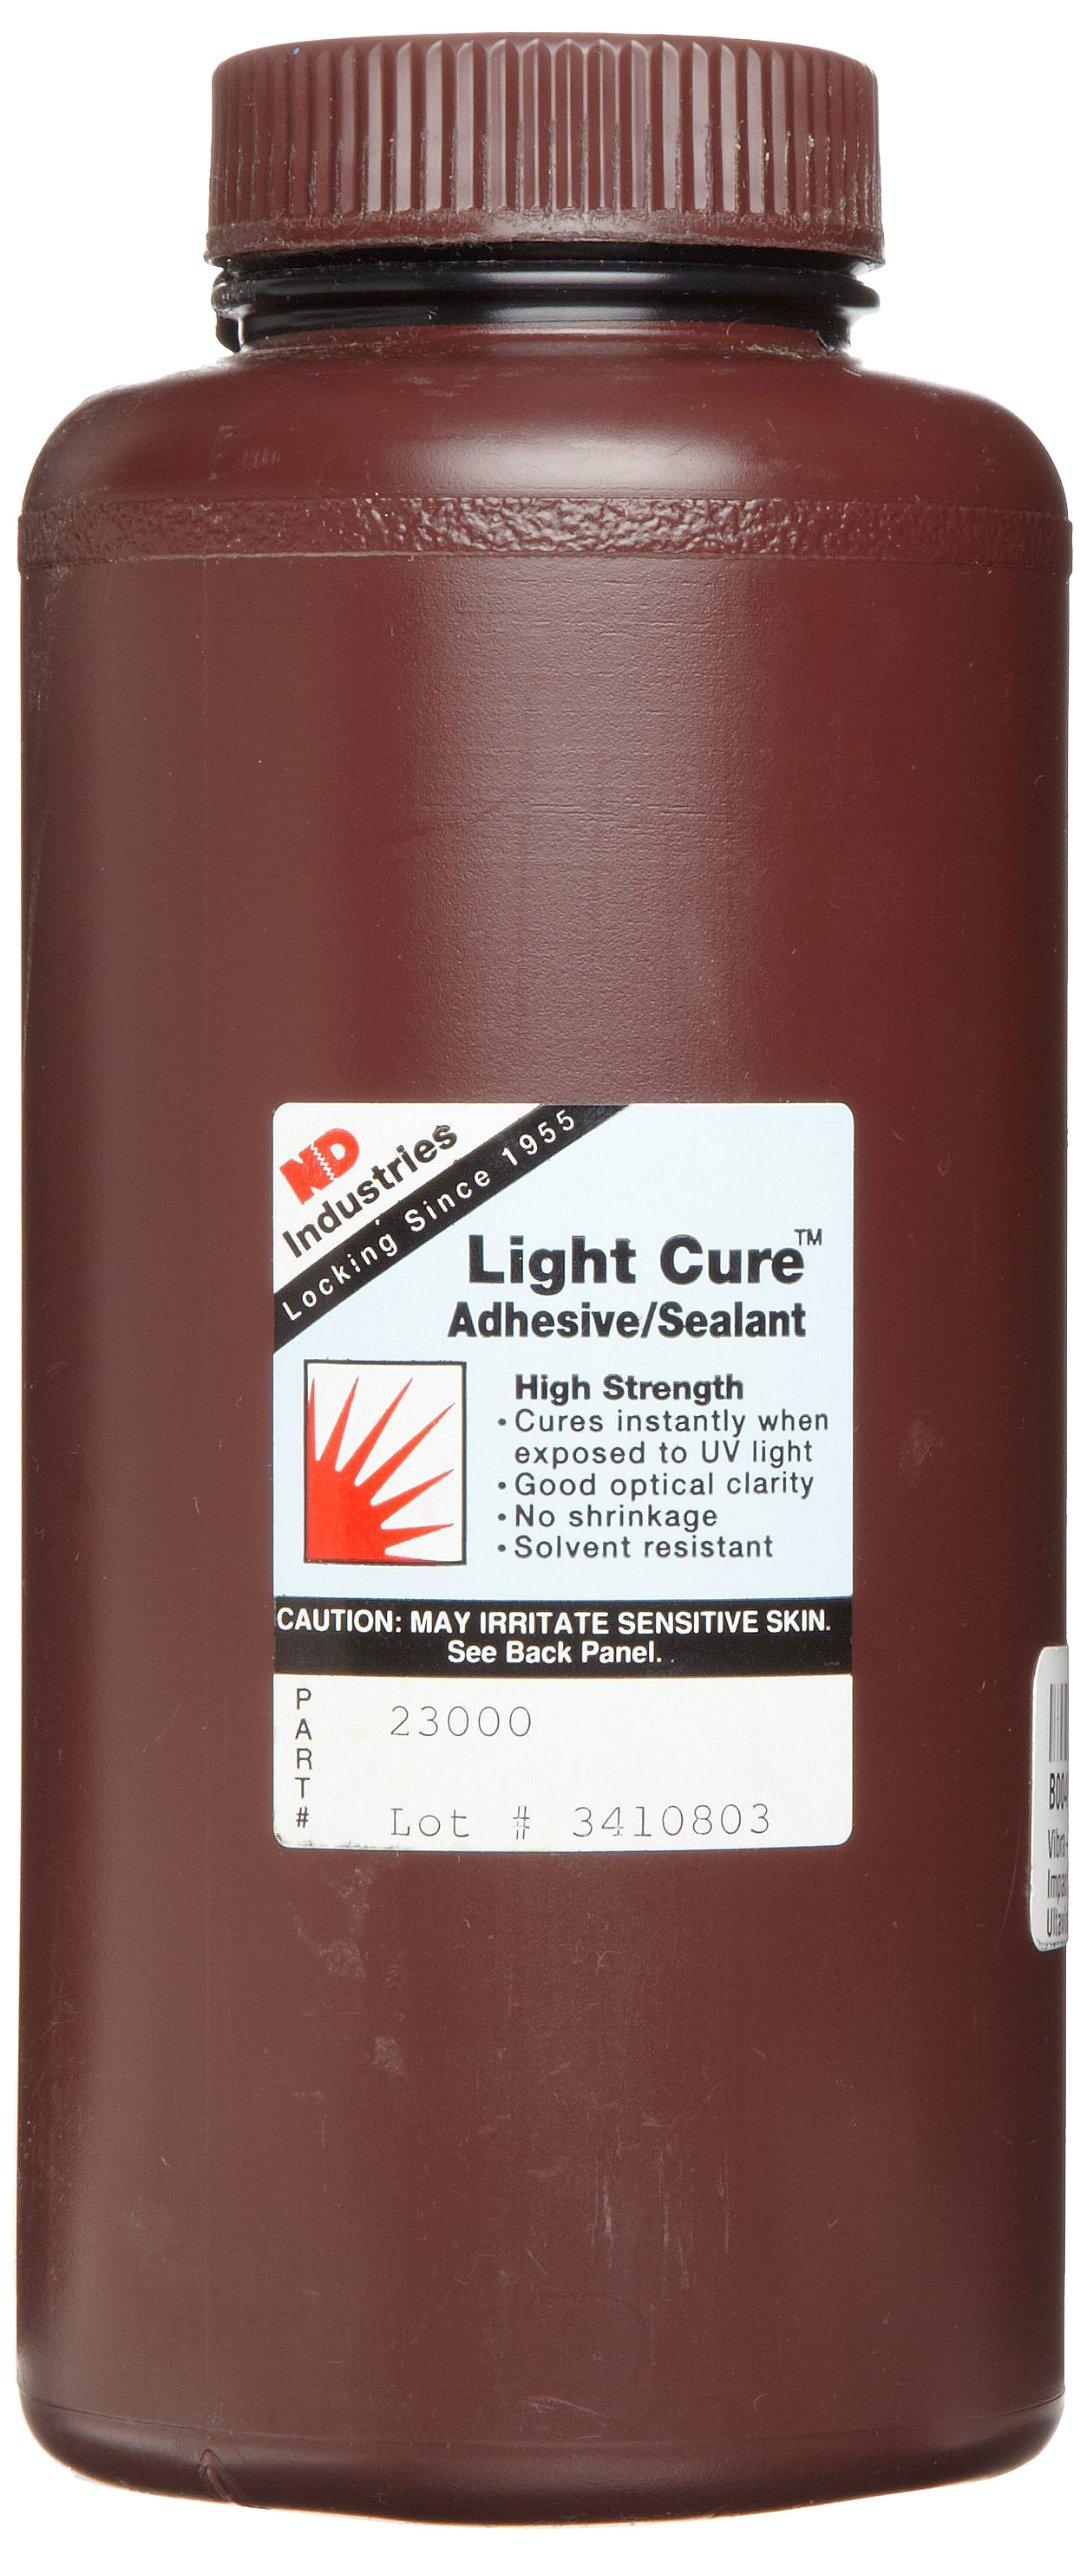 Vibra-TITE 230 Impact Resistant Ultaviolet/Heat/Activator Structural Light Cure Adhesive, 1 Liter Bottle, Clear/Amber